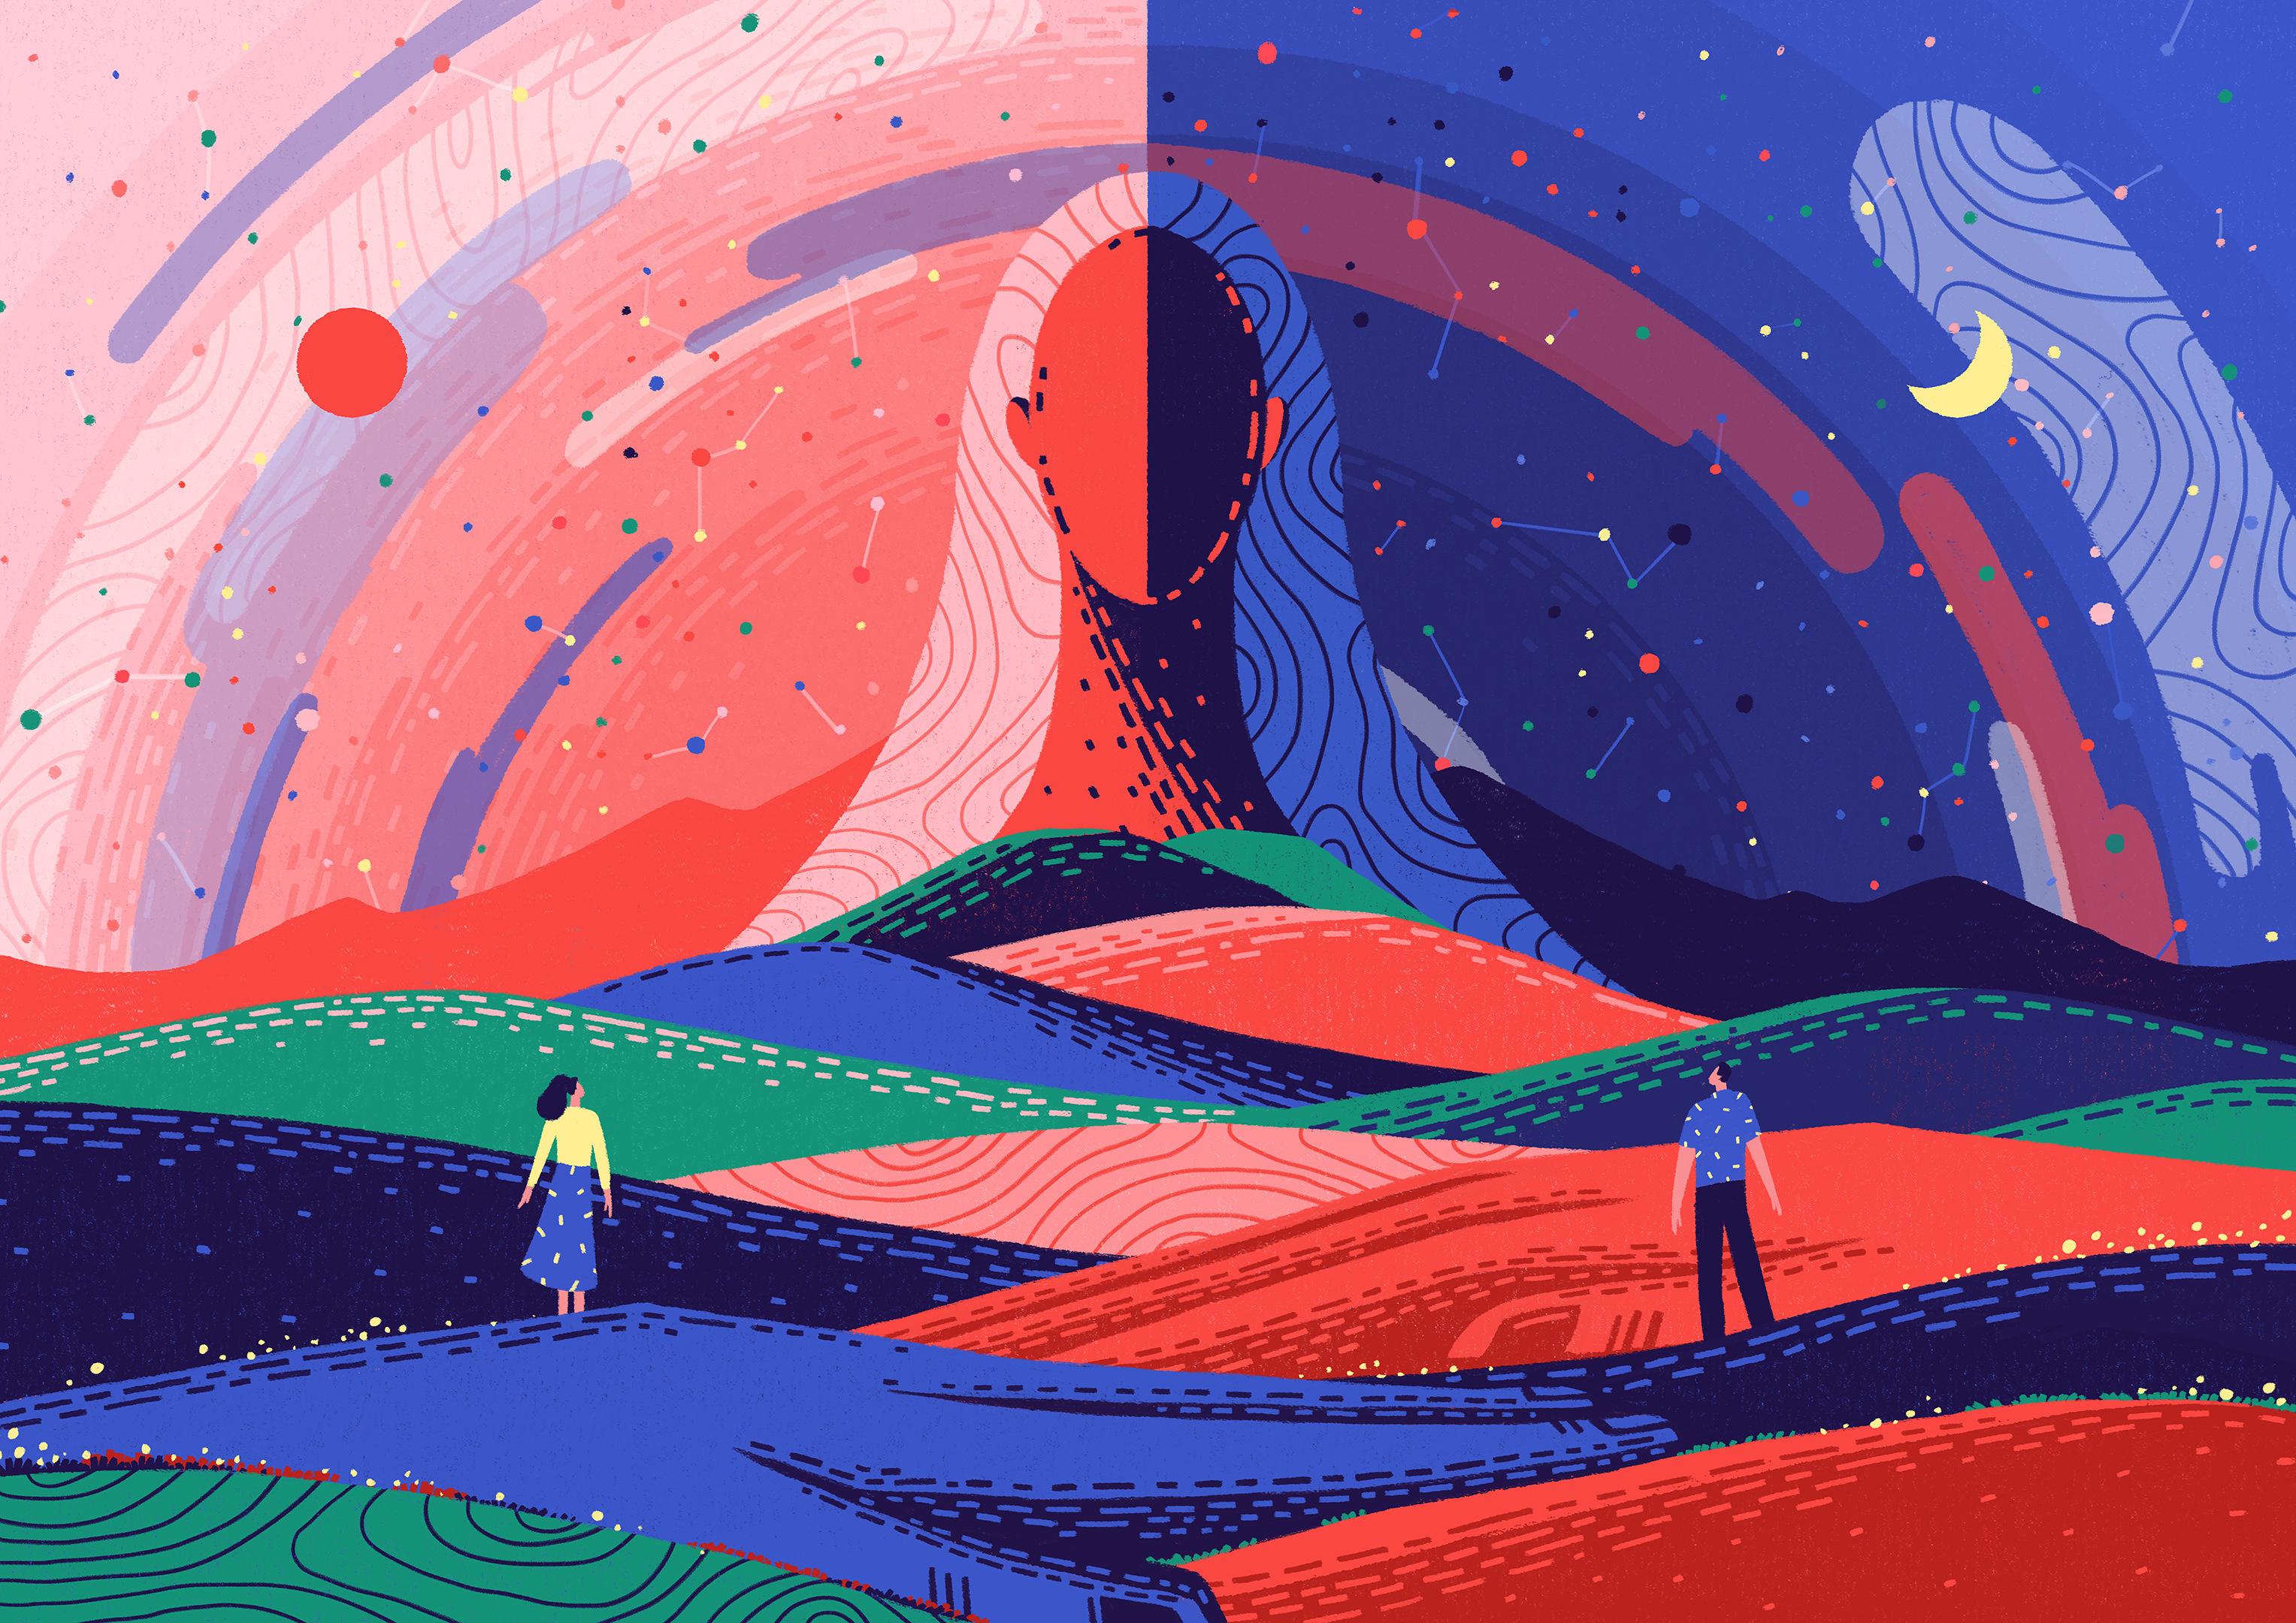 Illustration by Yukai Du